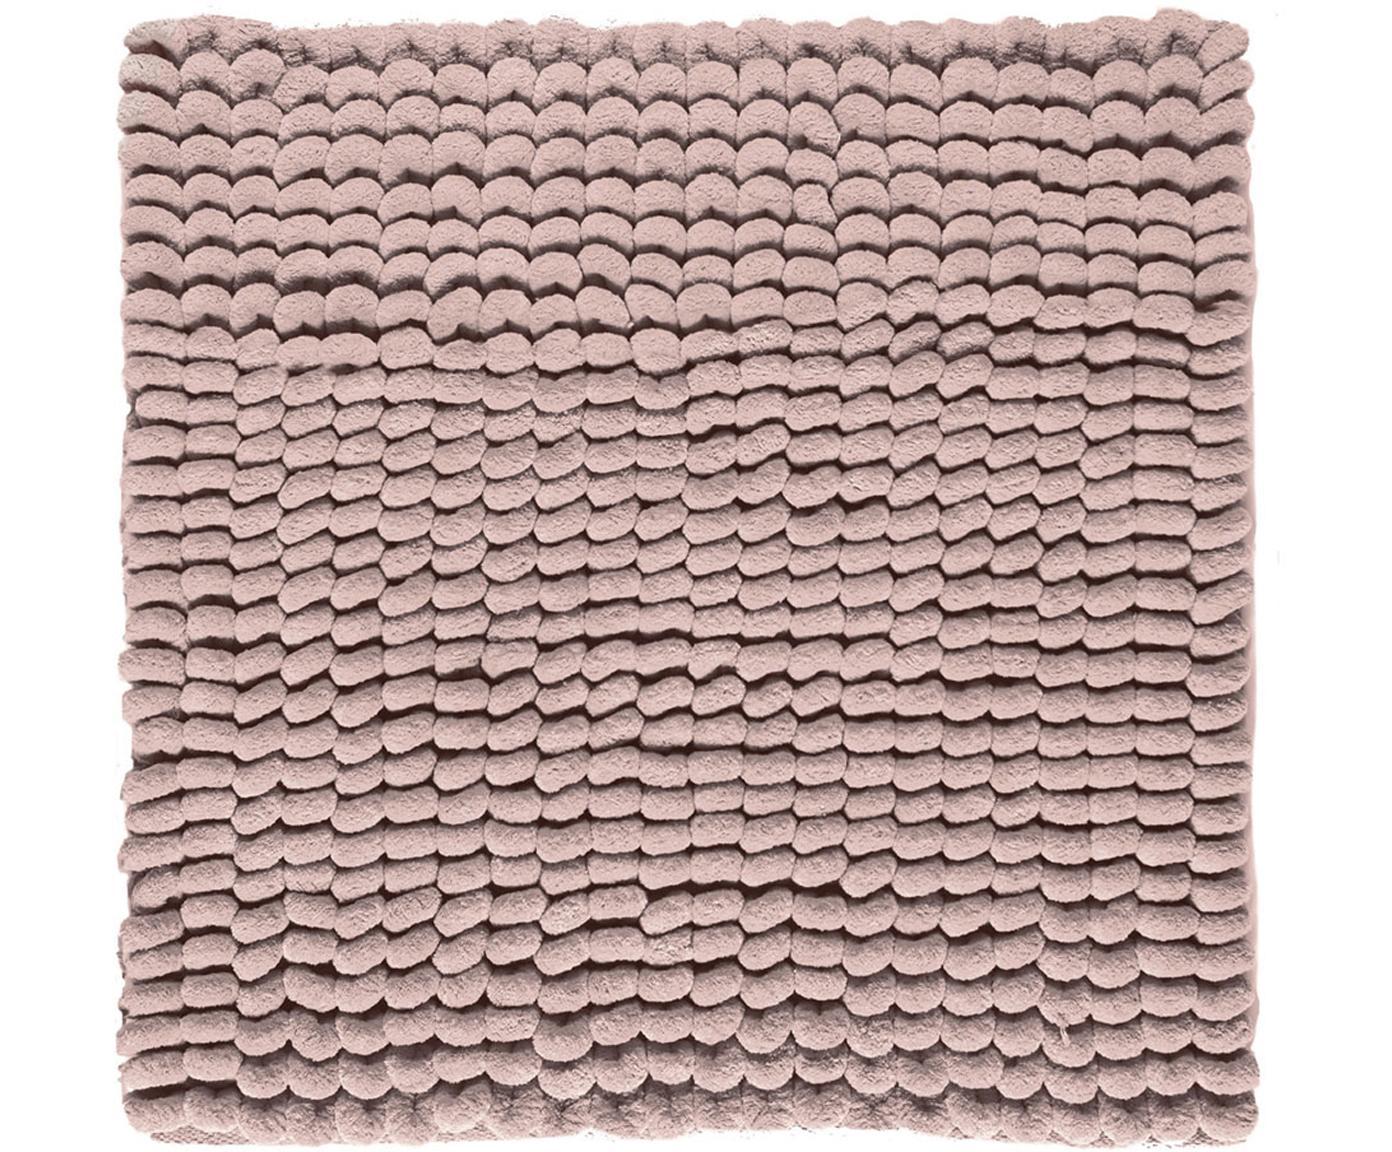 Zacht badmat Luka, 67% polyester, 33% katoen, Roze, 60 x 60 cm